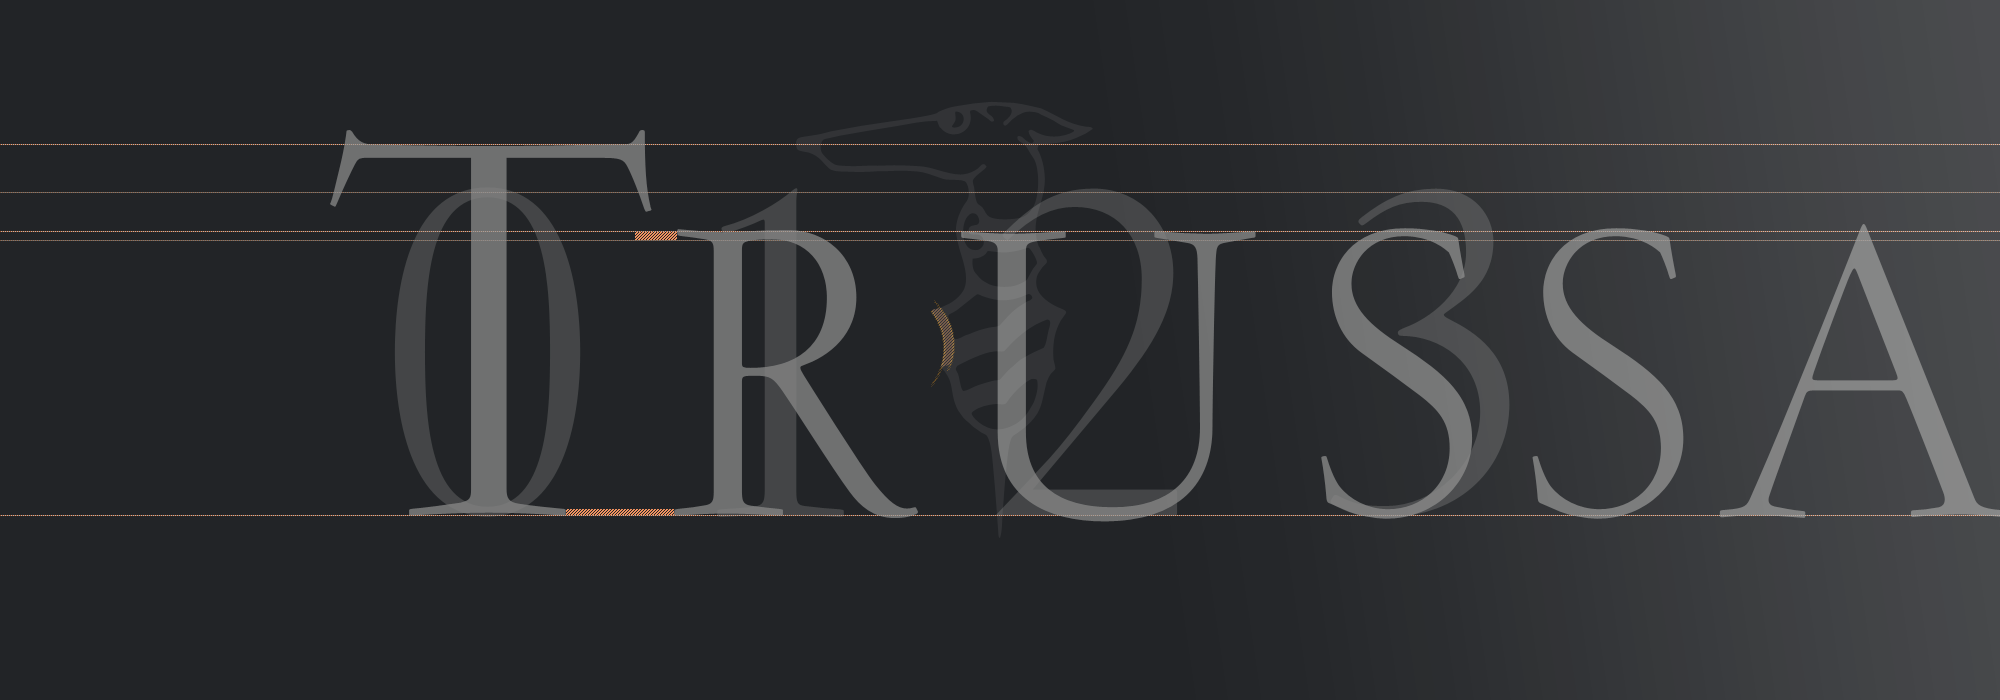 "Typeface Customization · <span class=""author"">Trussardi</span> Stationery"